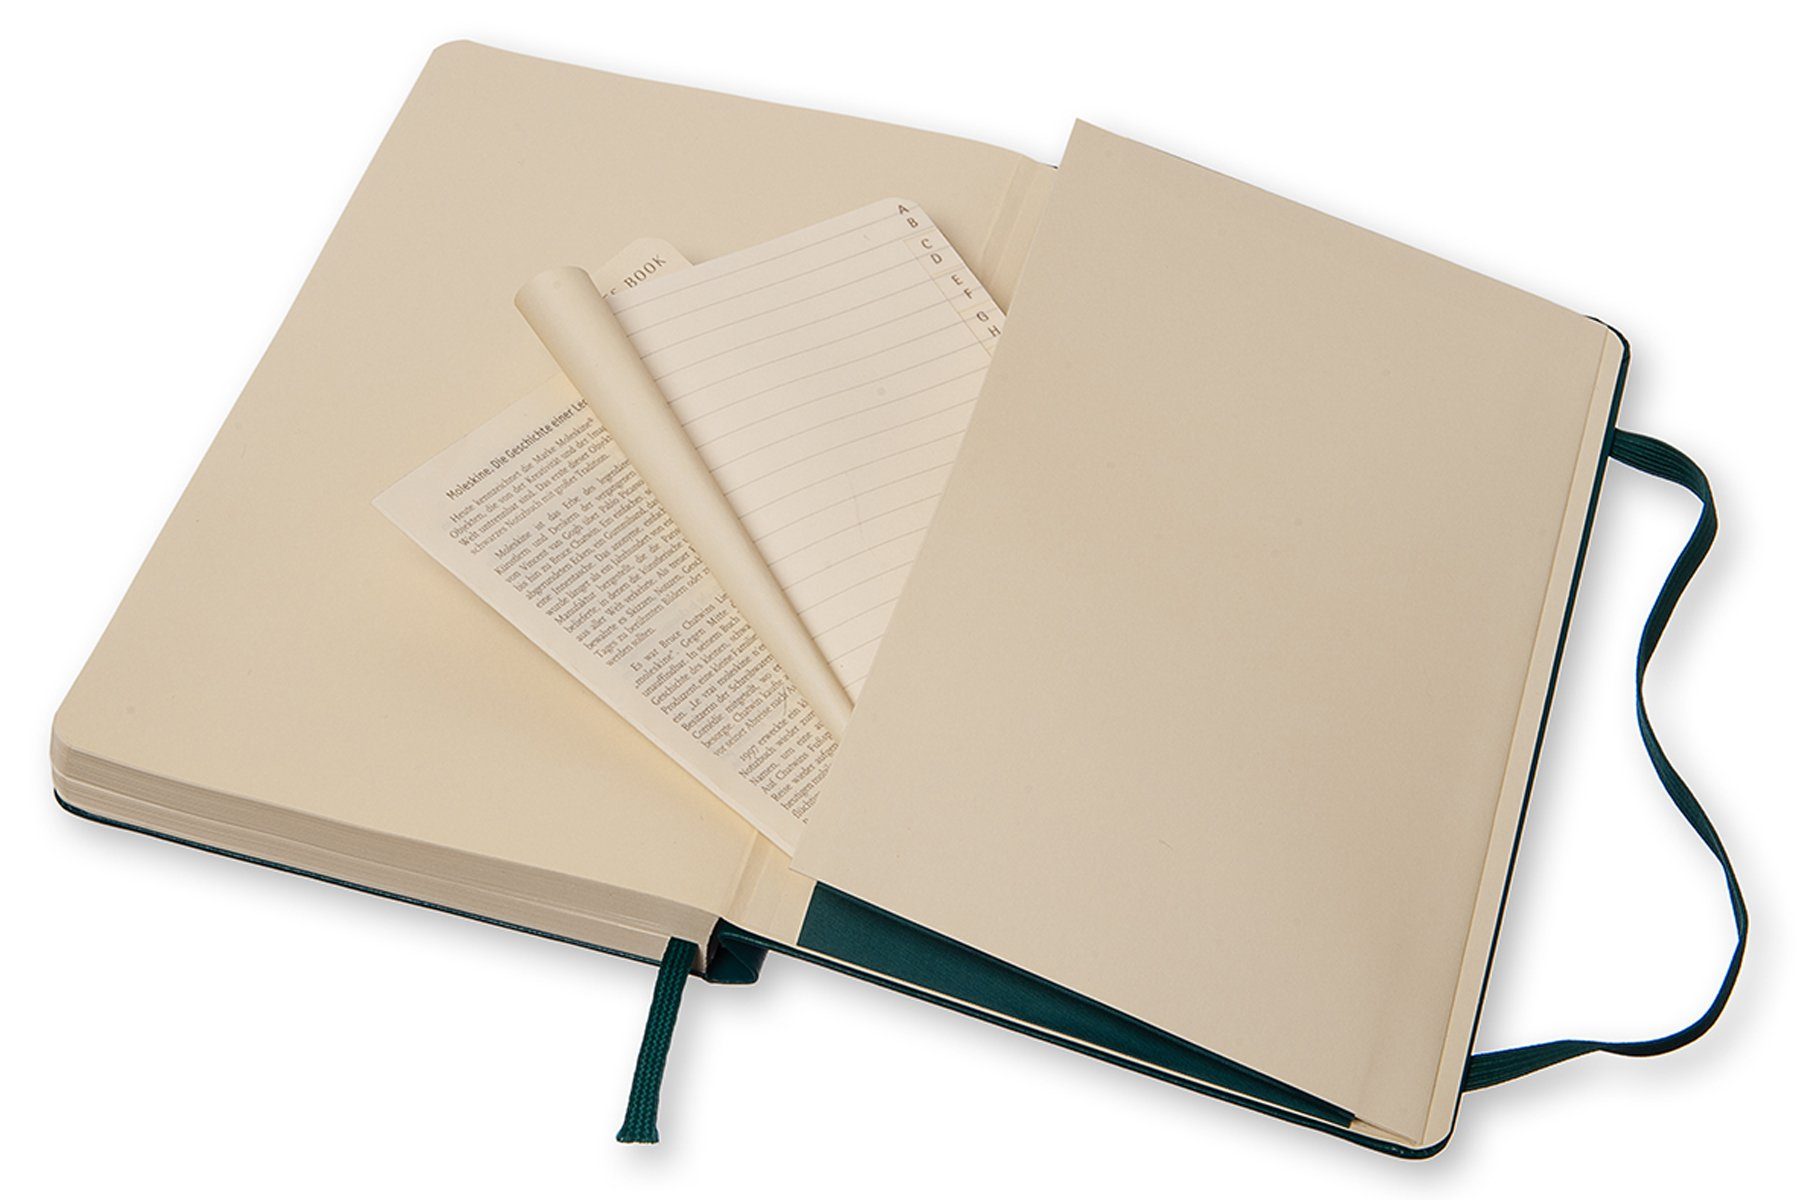 Agenda Journalier 2016 Grand Format Vert Couv Rigide: Amazon ...